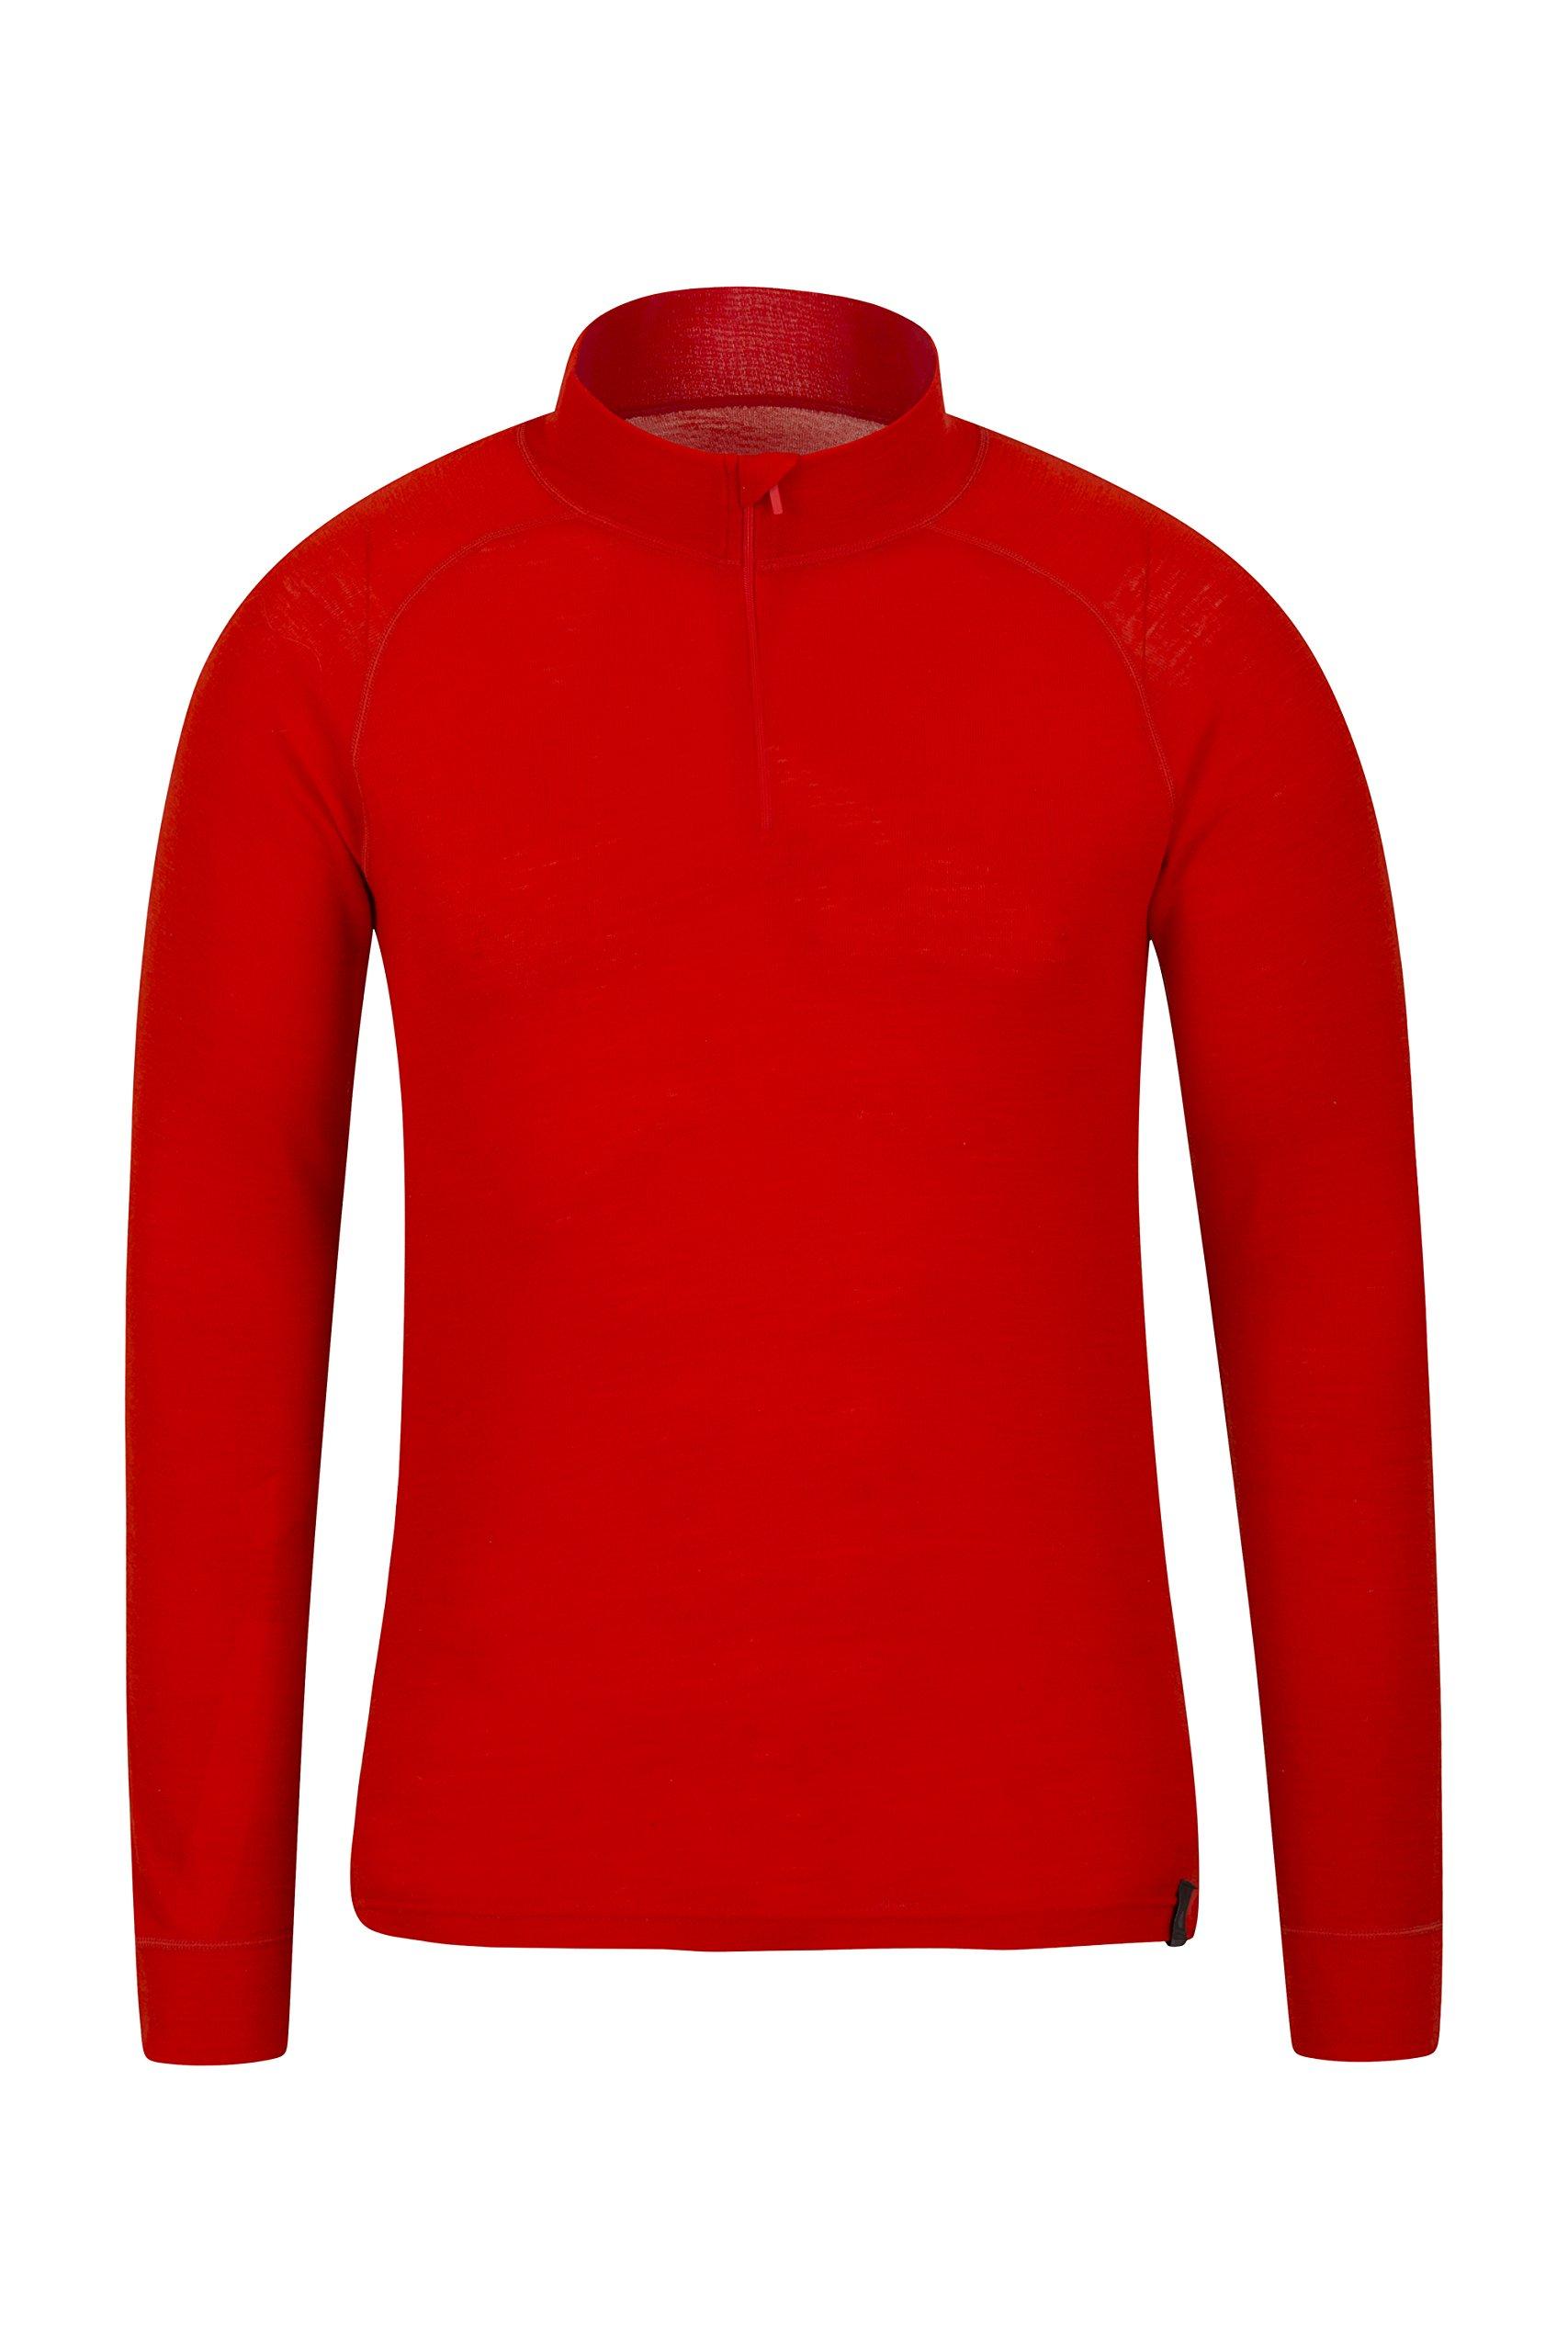 Mountain Warehouse Merino Mens Top - Breathable Tshirt, Half Zip Tee Orange Large by Mountain Warehouse